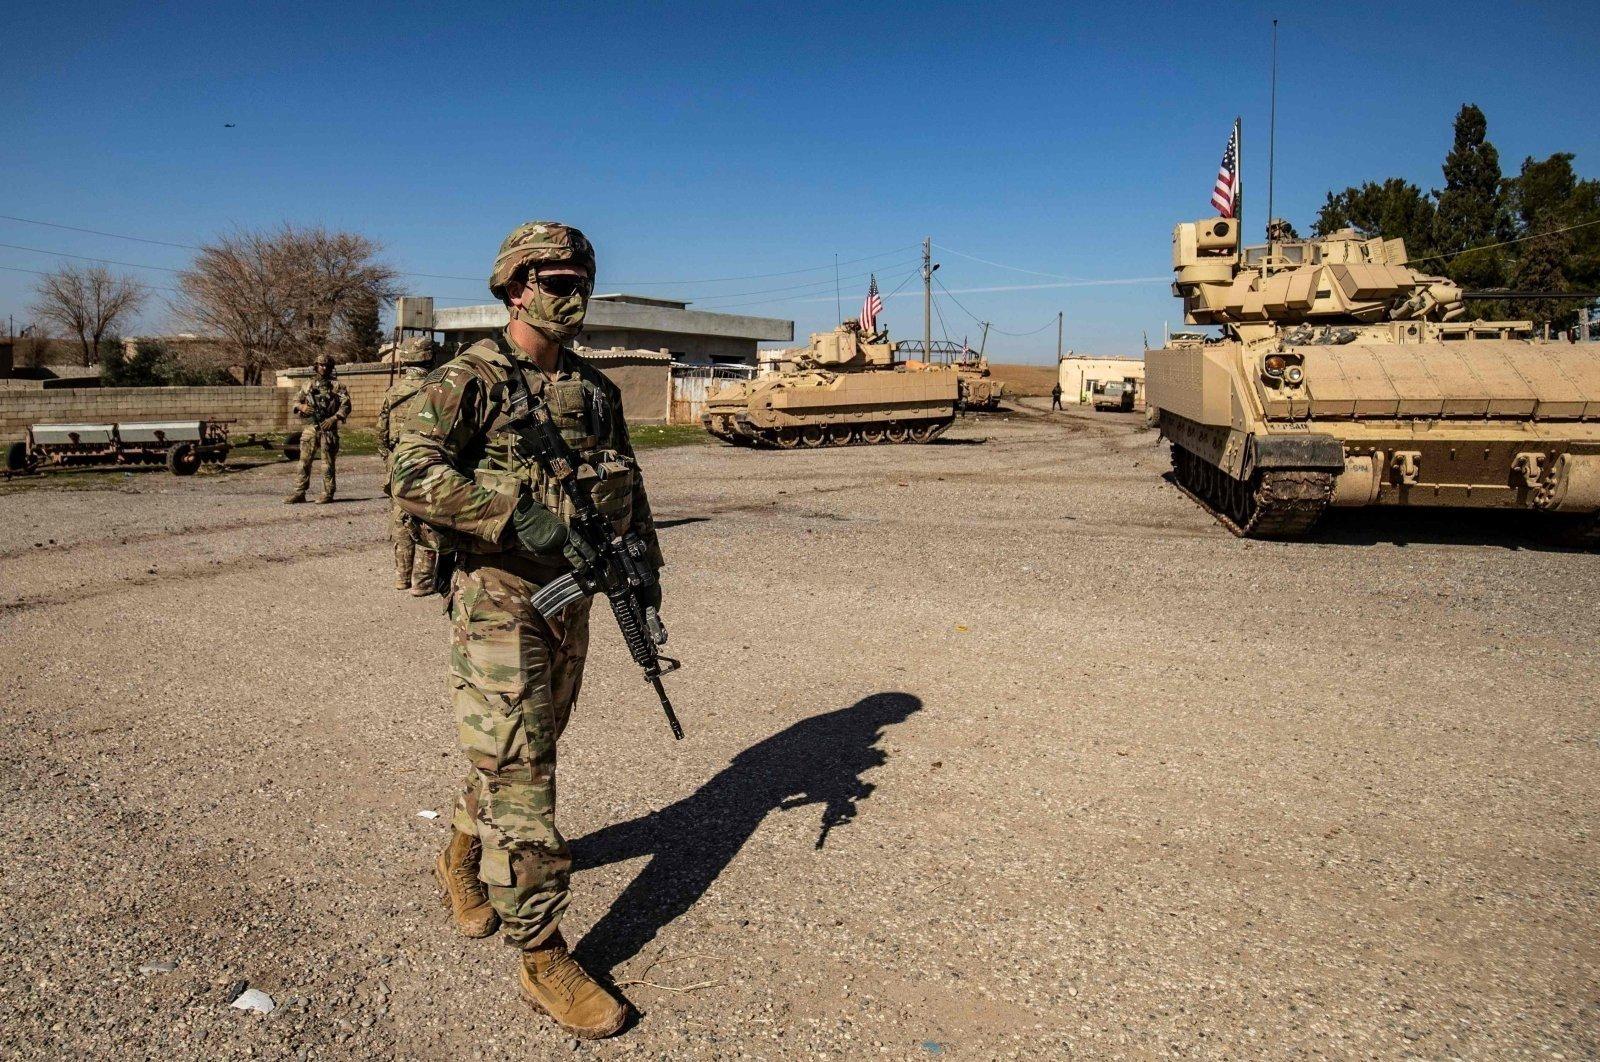 A U.S. soldier walks near a Bradley Fighting Vehicle (BFV) during a patrol in the countryside near al-Malikiyah (Derik) in Hassakeh province, northeastern Syria, Feb. 2, 2021. (AFP Photo)